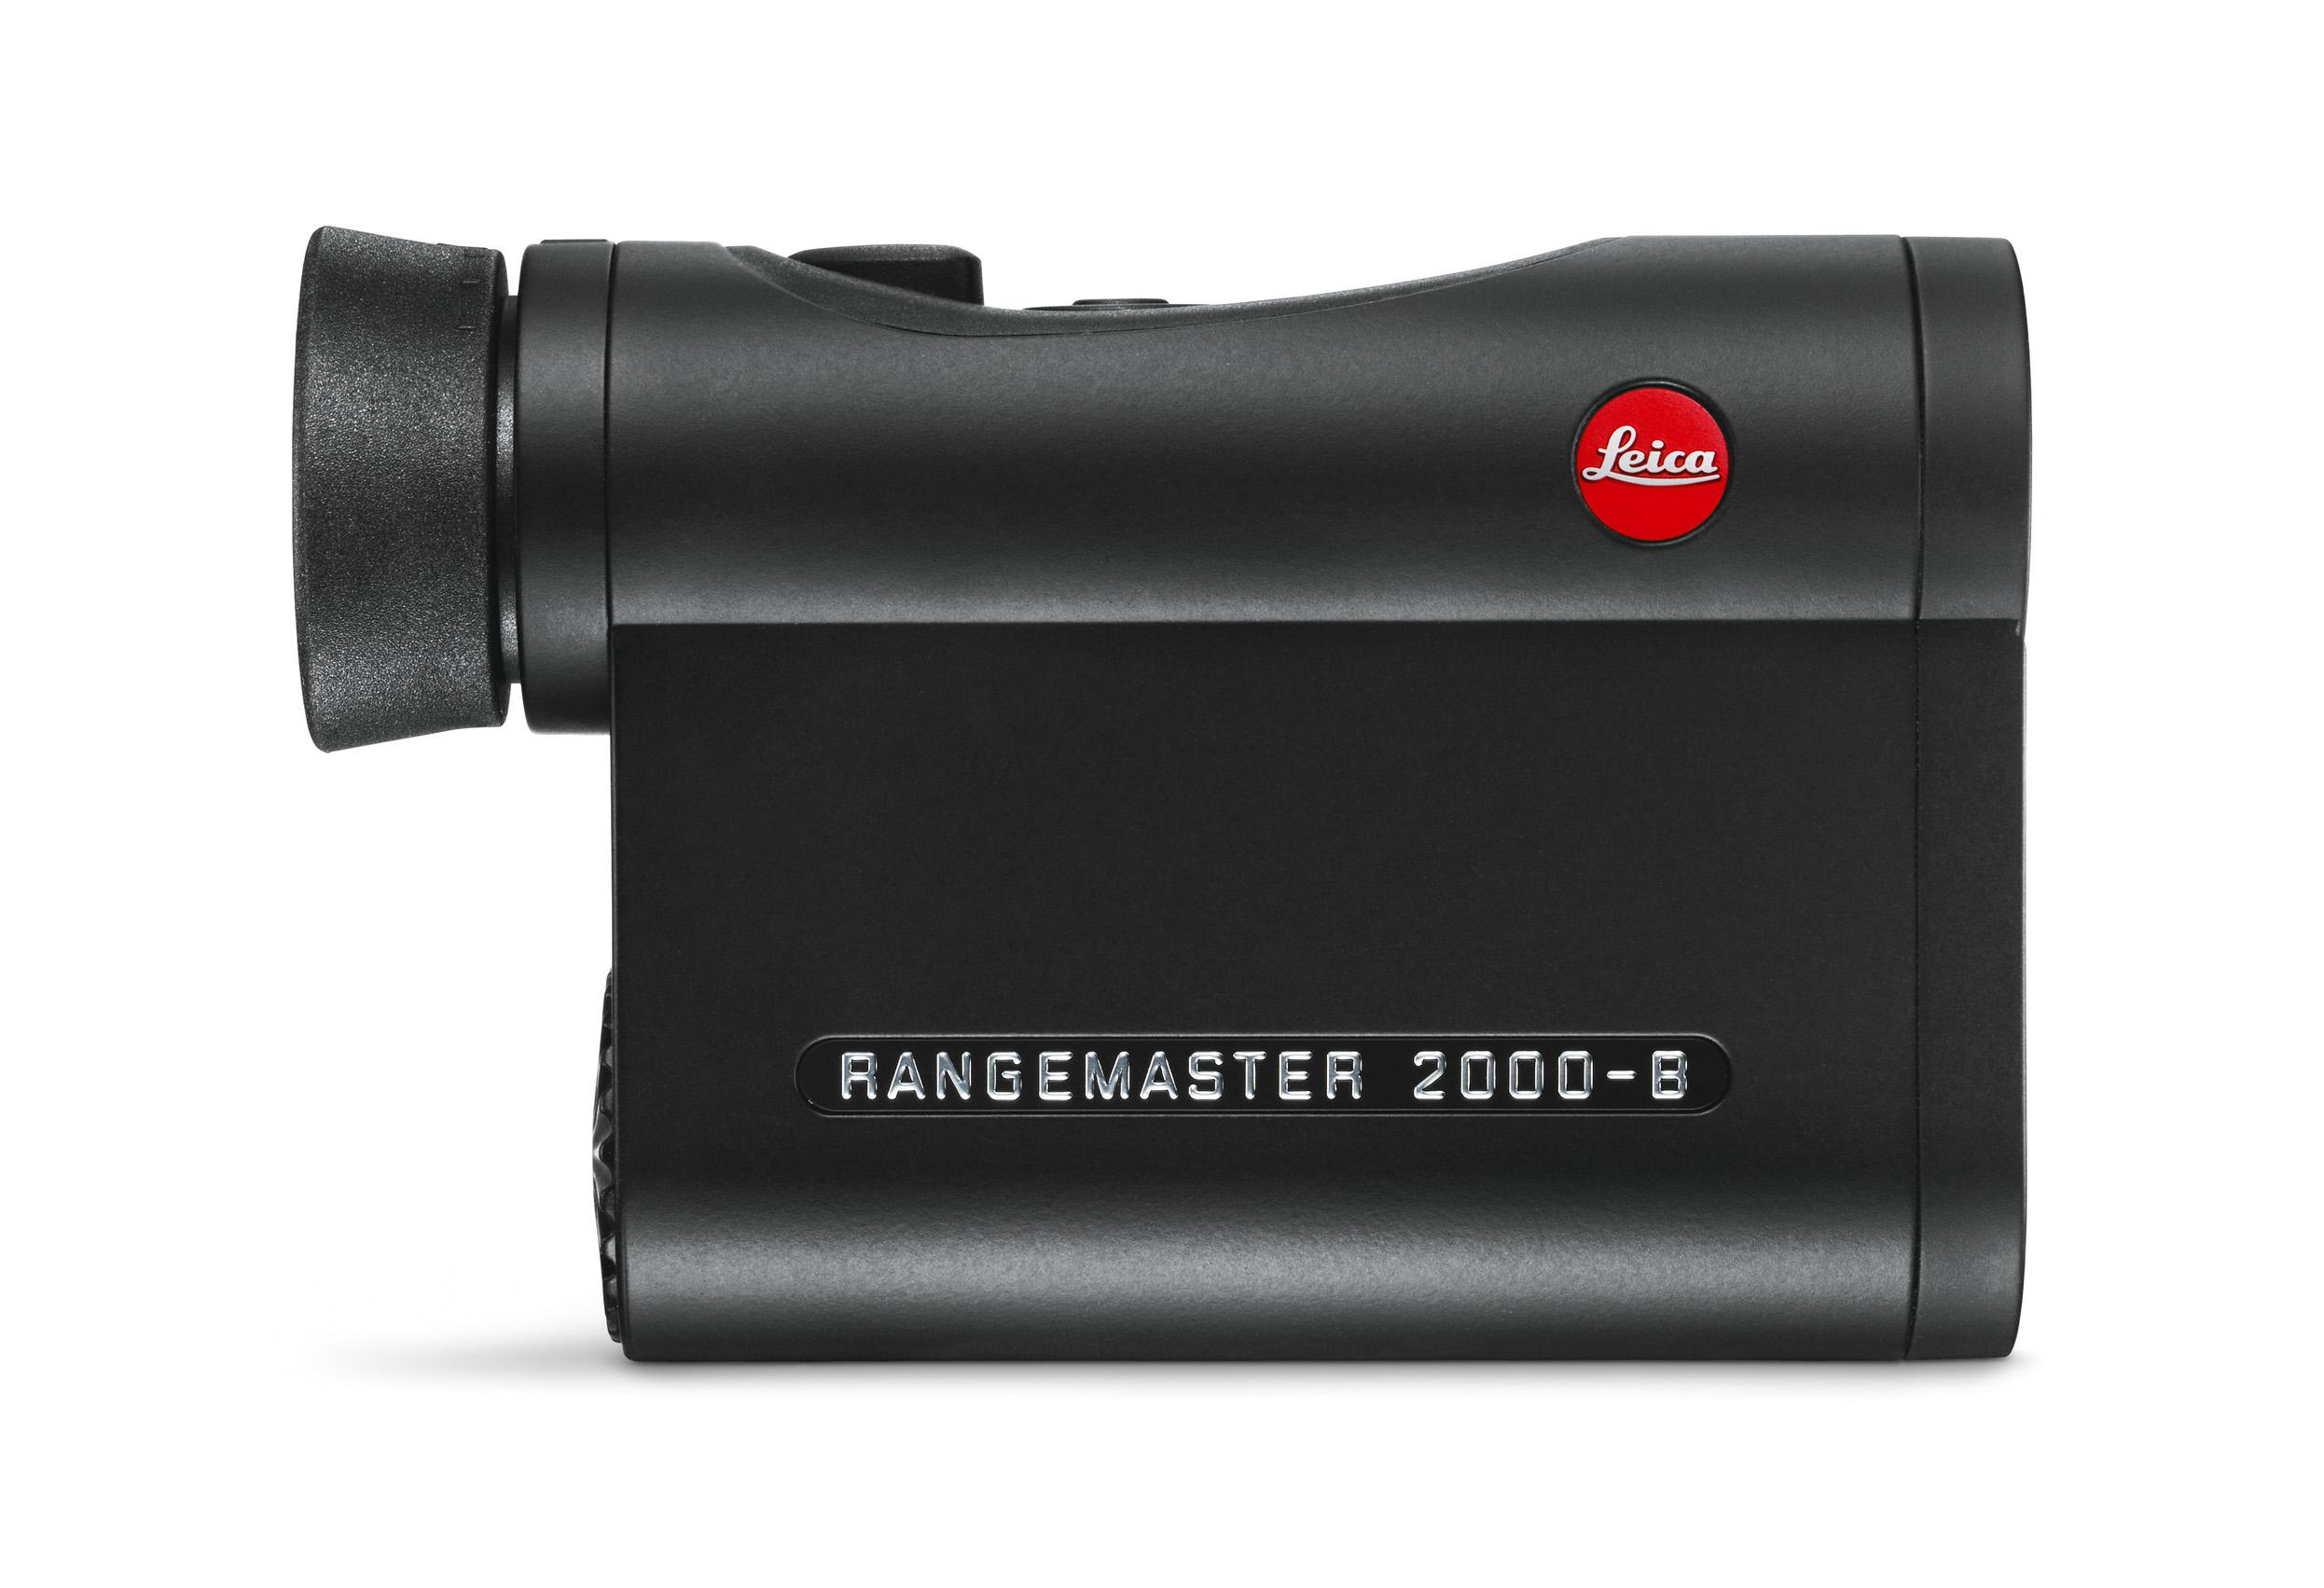 Leica Entfernungsmesser Rangemaster Crf 2700 B : Leica rangemaster crf b entfernungsmesser